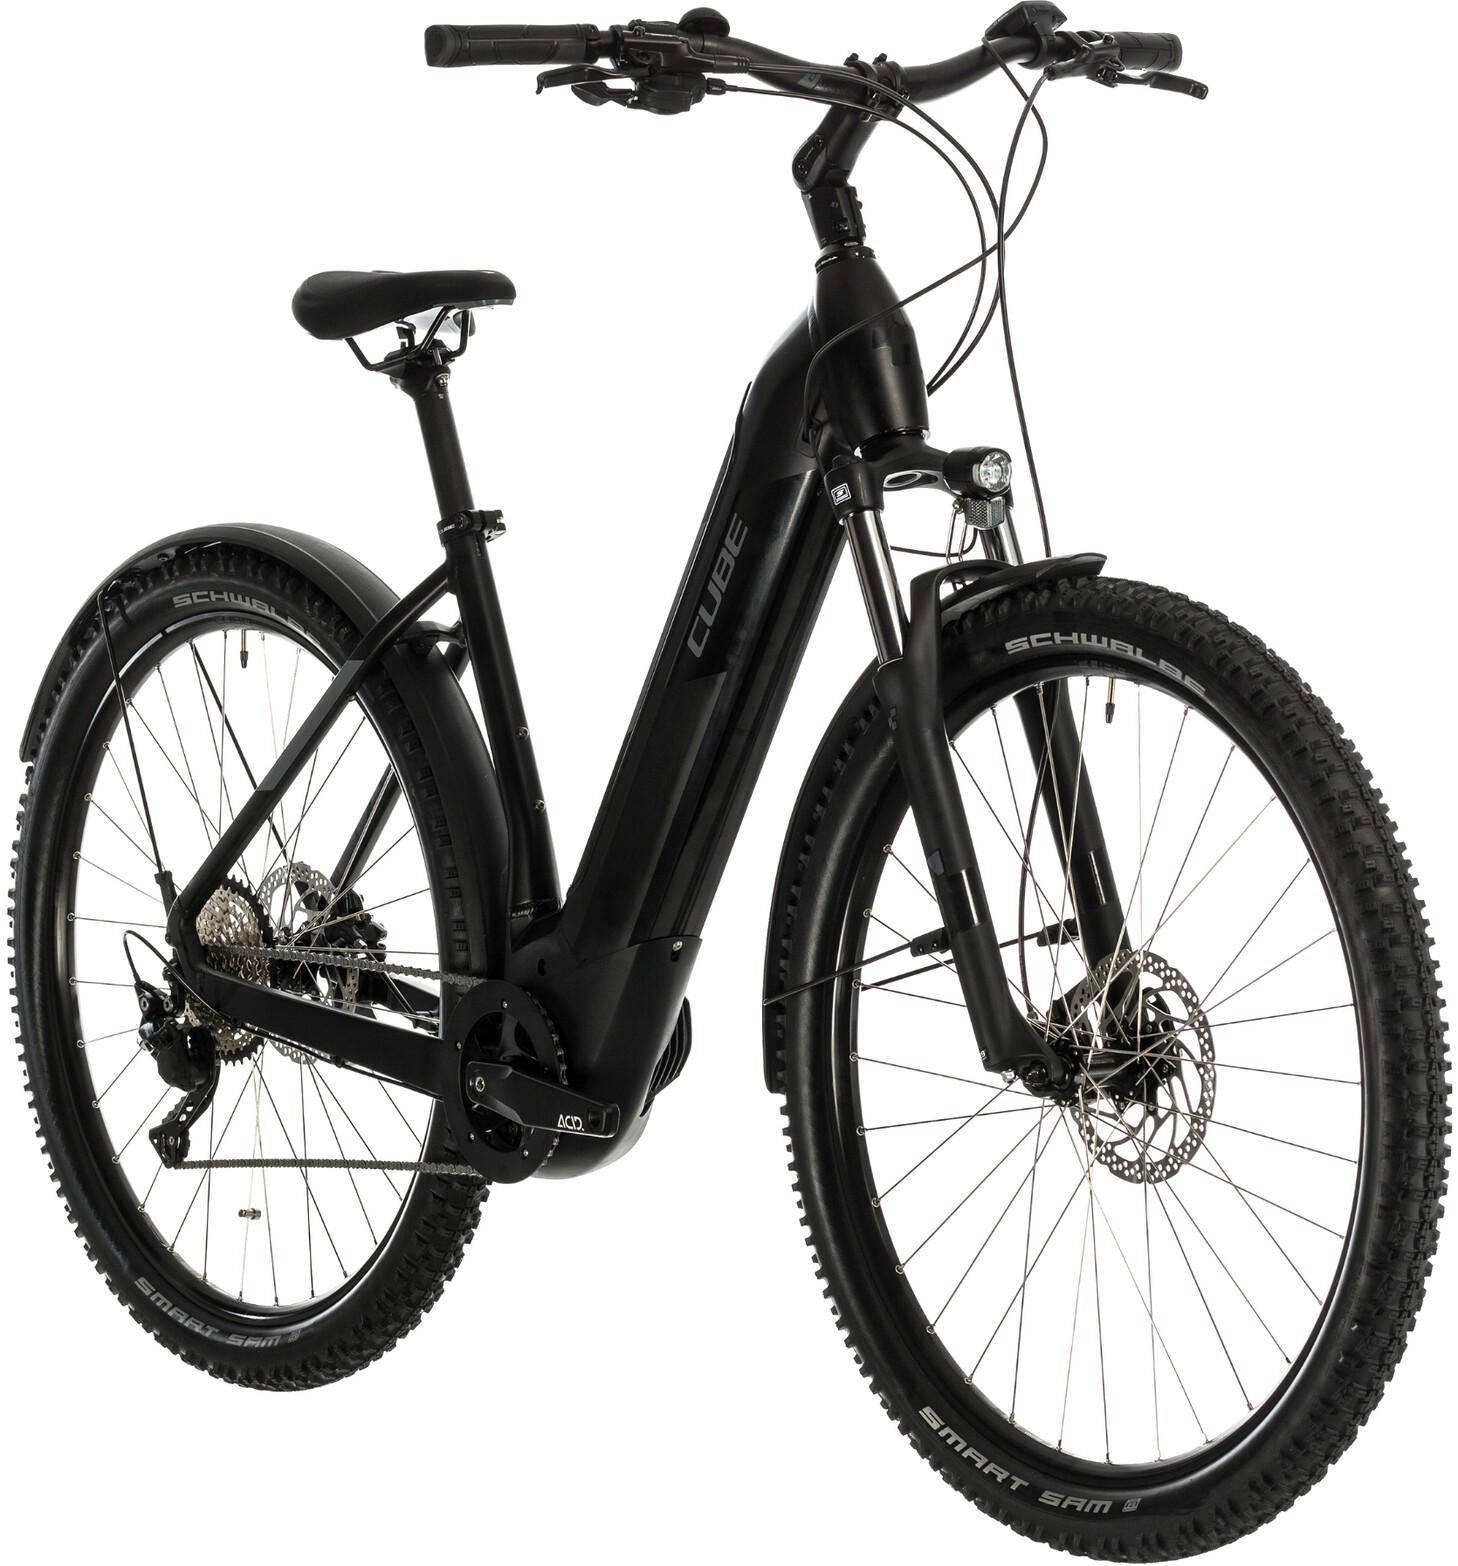 31,8 x 34,9 mm, Fibra de Carbono TRIAERO Abrazadera para sill/ín de Bicicleta Color Negro